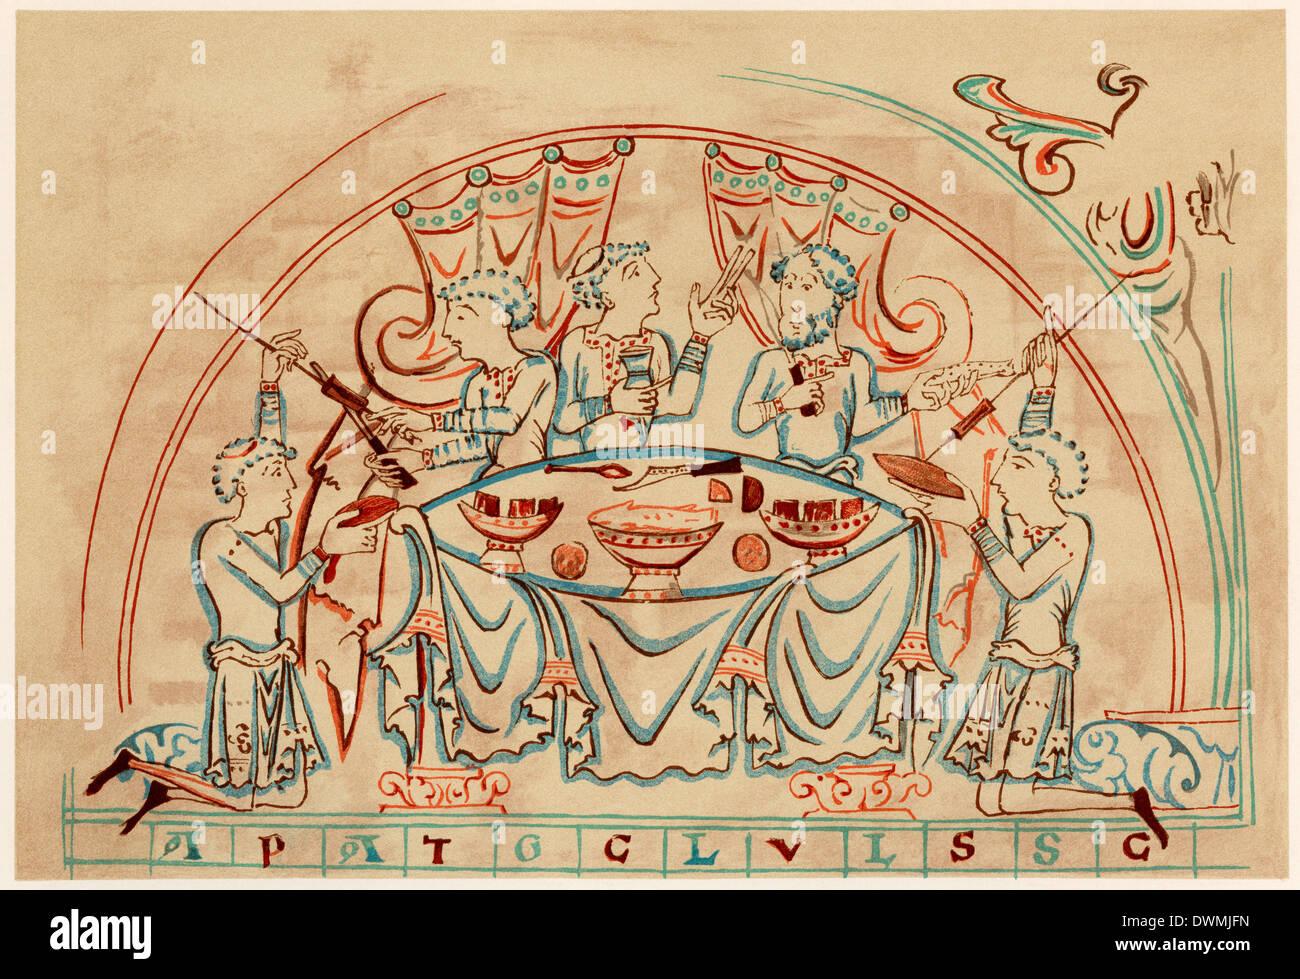 Rittermahl, aus dem 11. Jahrhundert. Gedruckte farbige Lithographie Stockbild